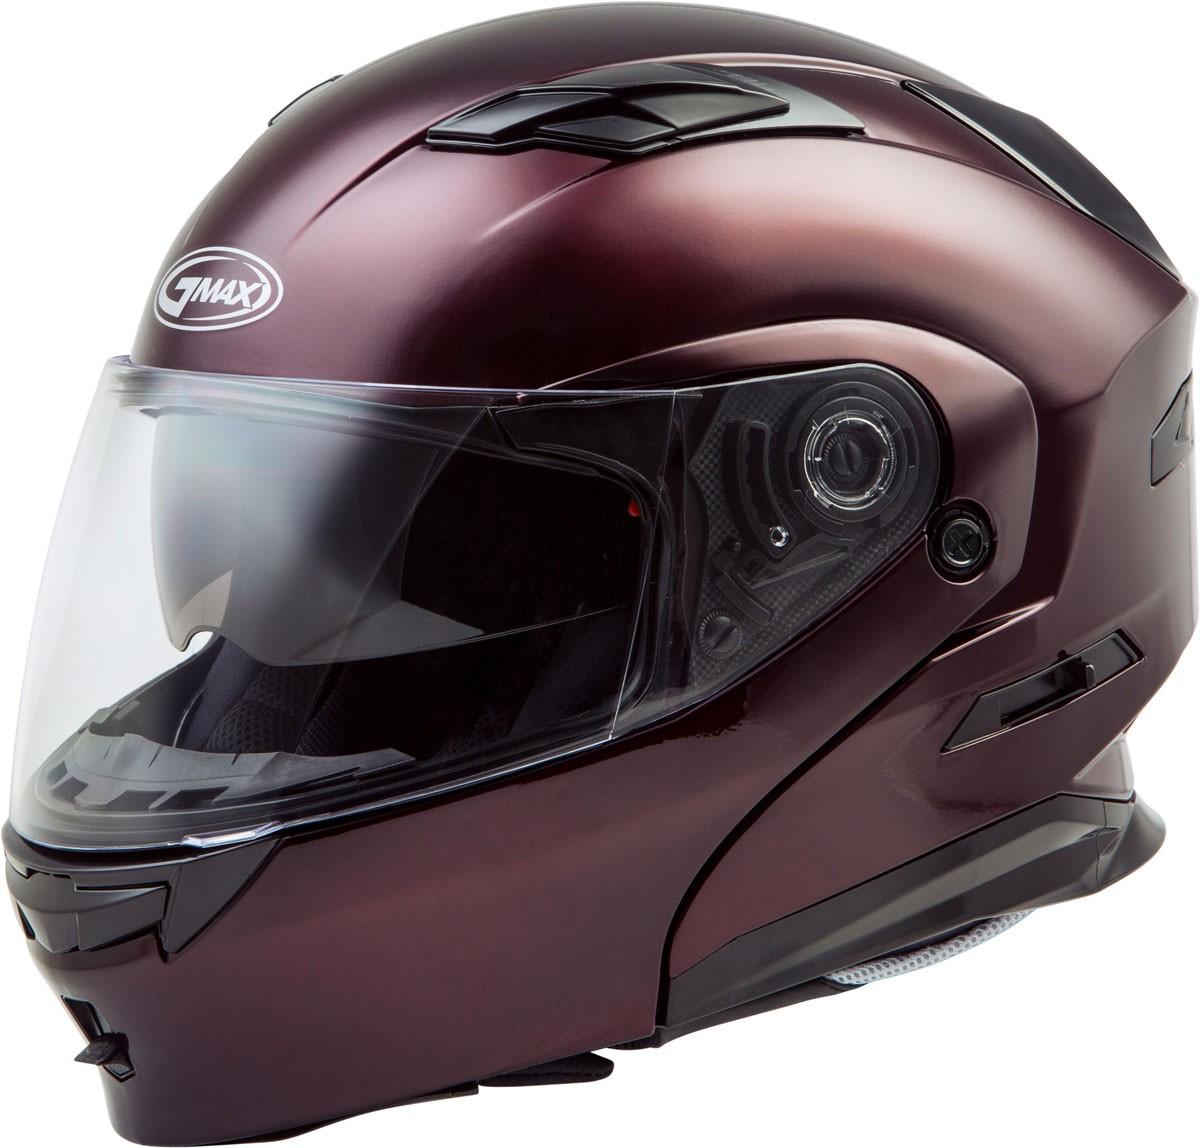 ab3754ab Modular Flip Up Dual Visor Sun Shield Motorcycle Helmet